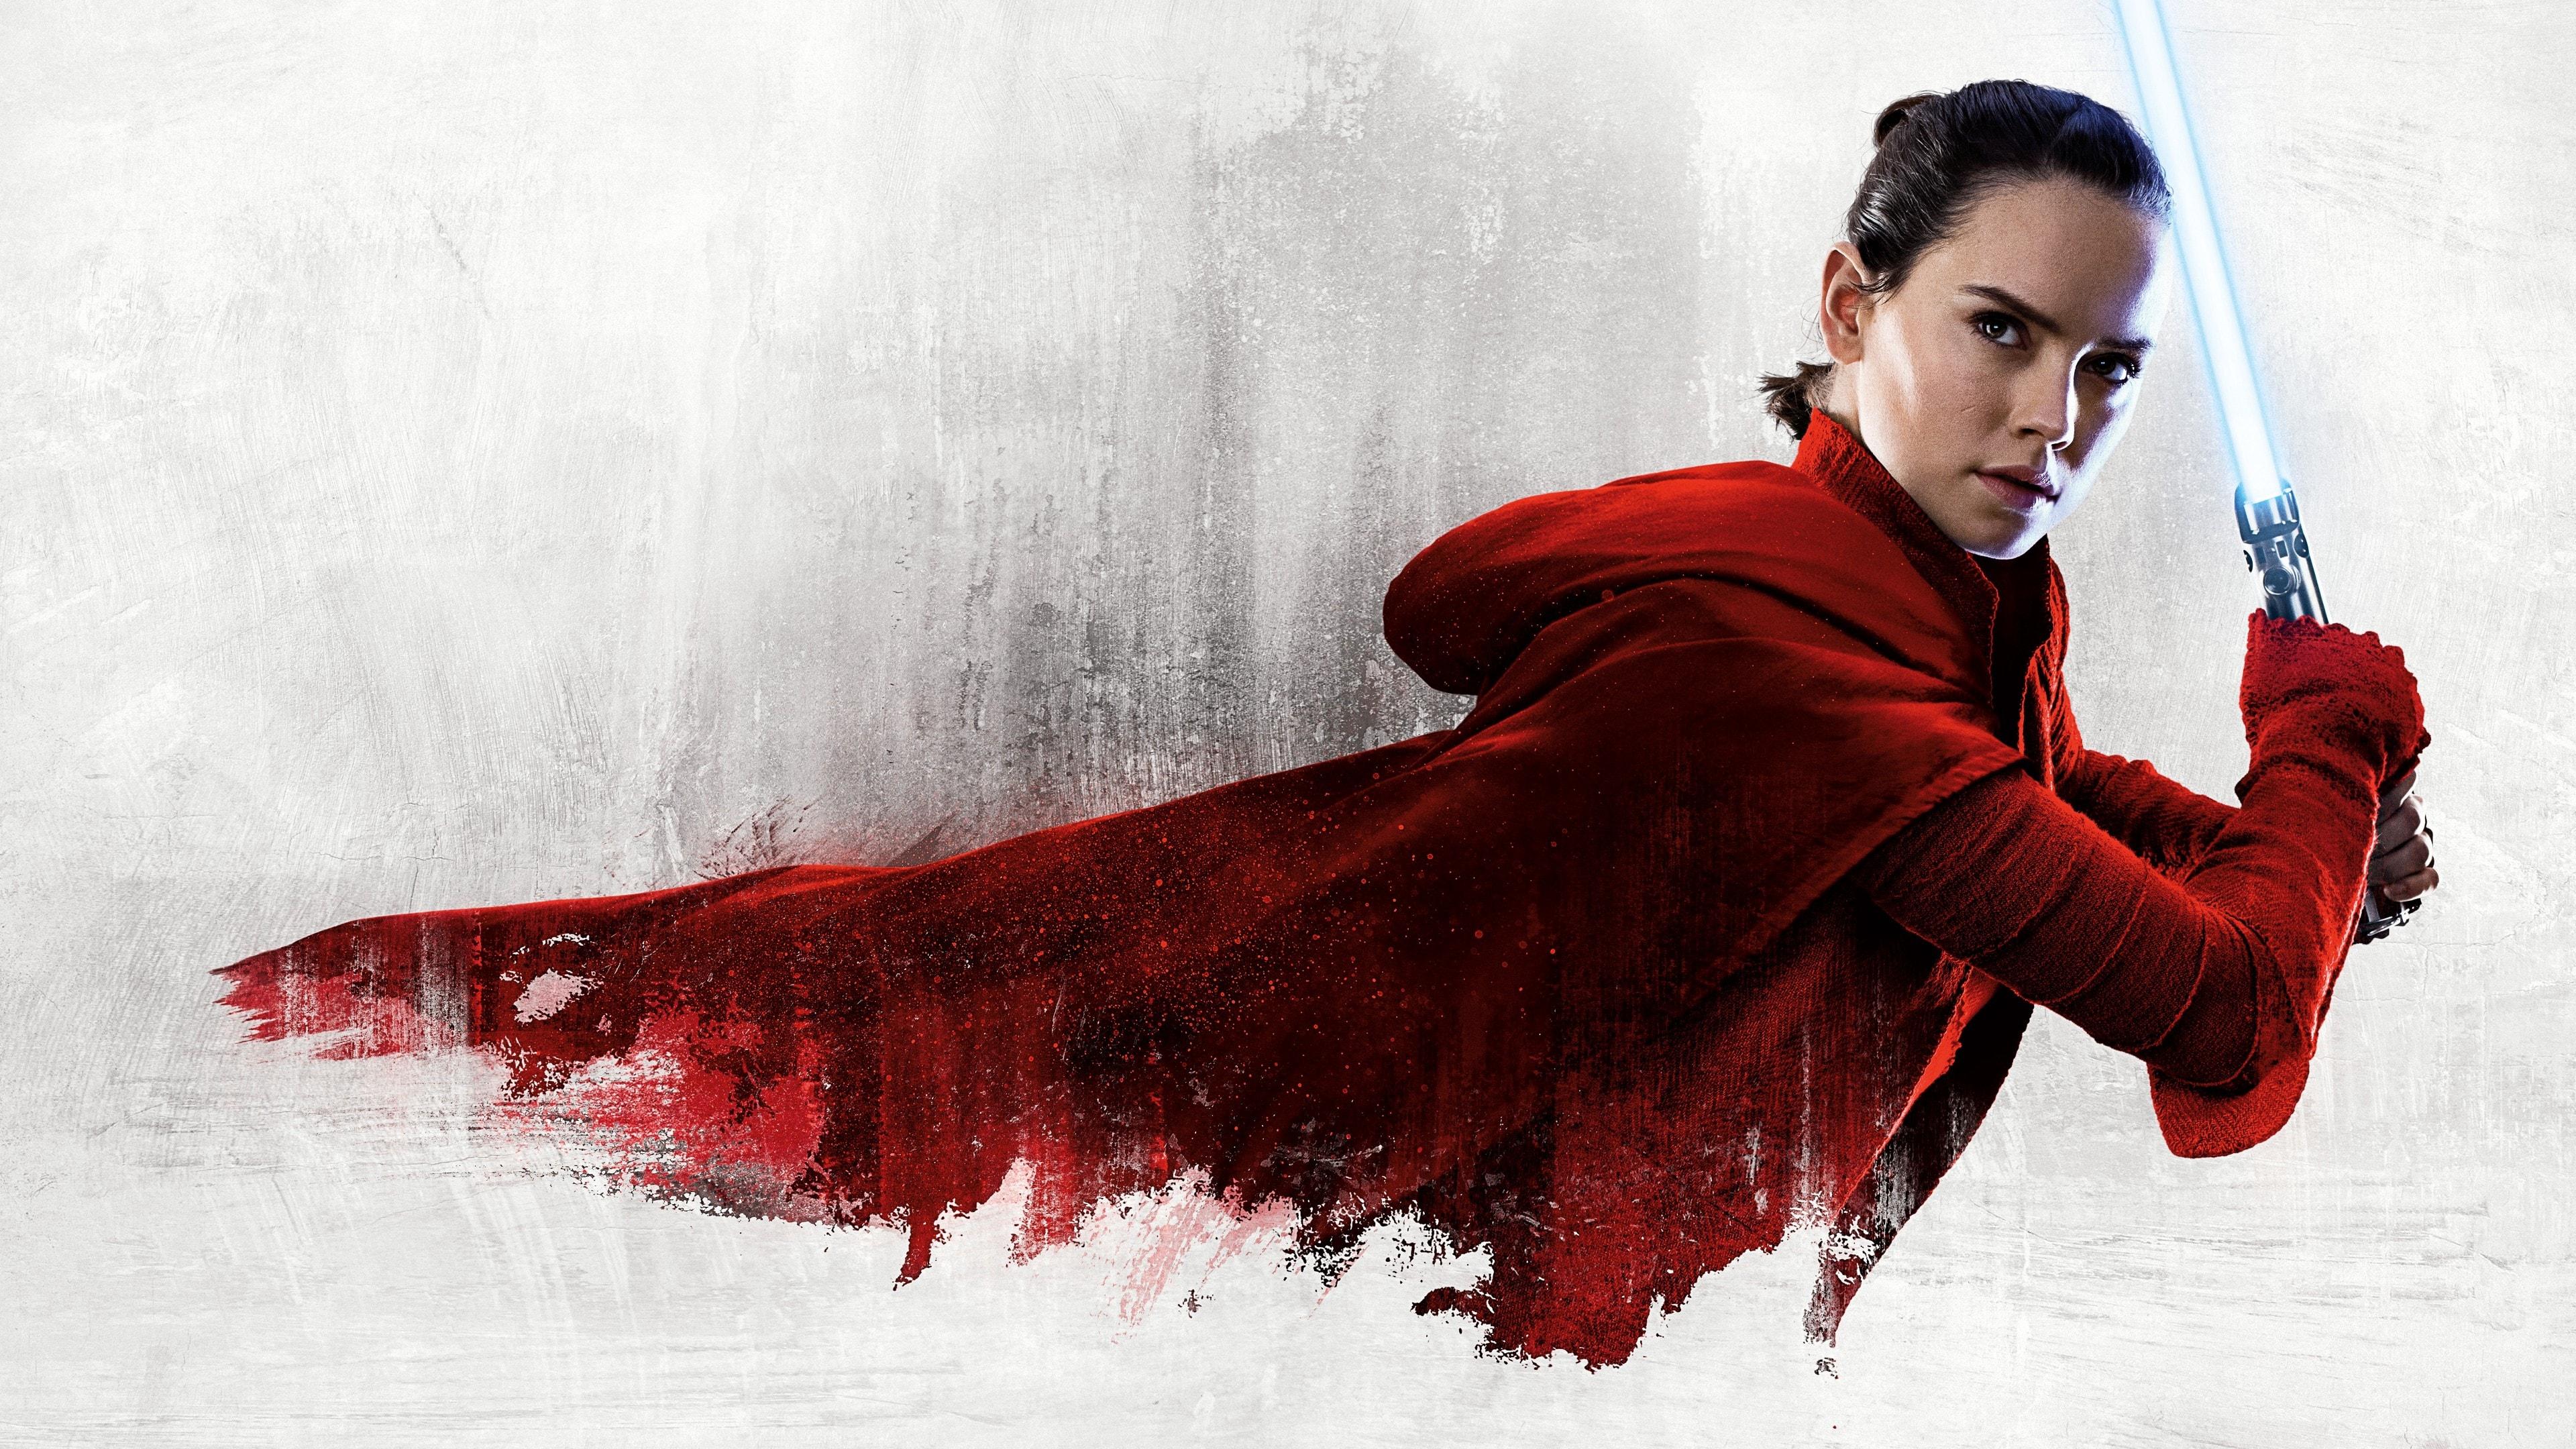 Star Wars Rey Wallpaper 4k 3840x2160 Download Hd Wallpaper Wallpapertip